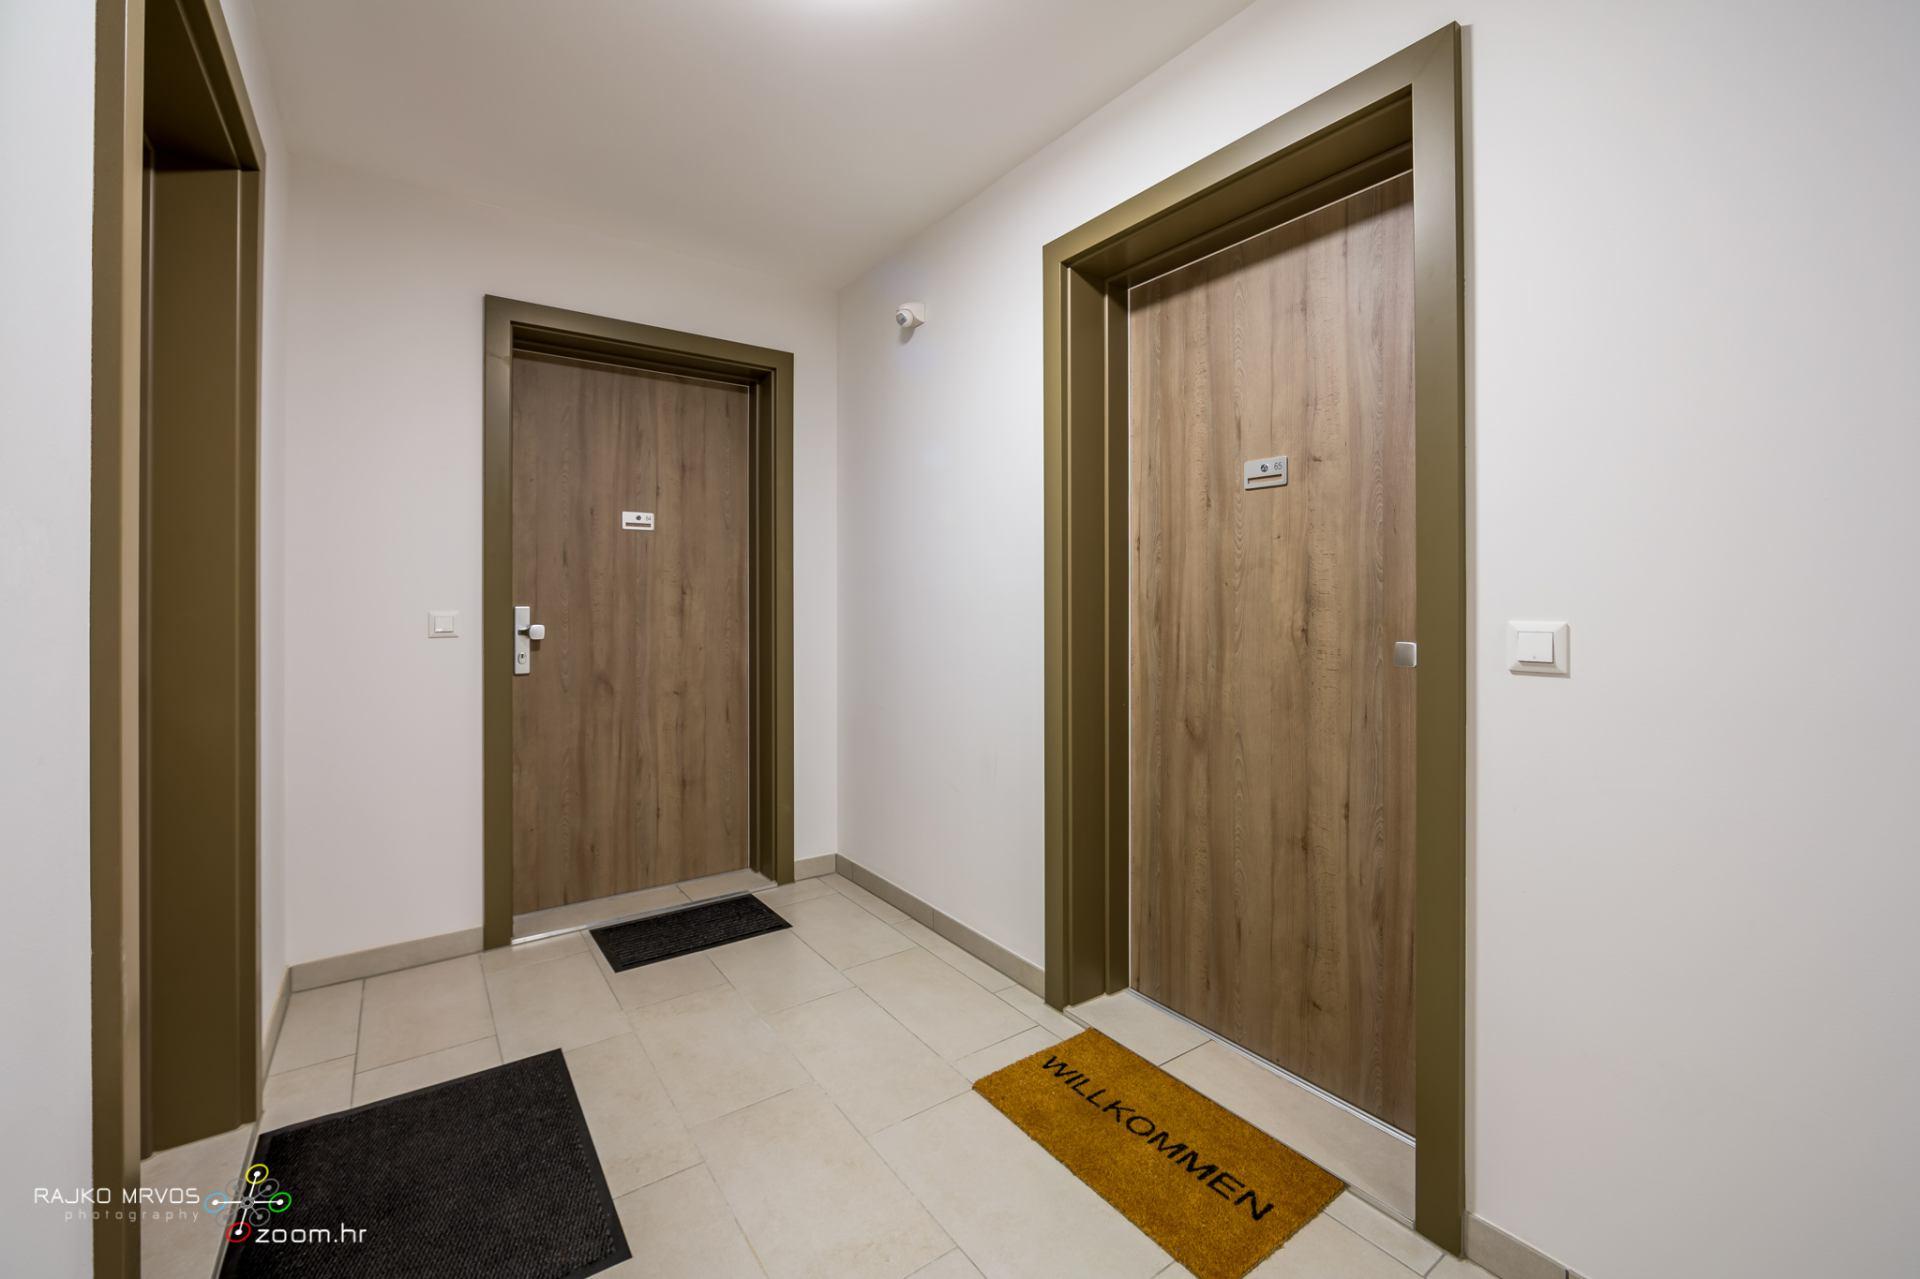 fotografiranje-interijera-fotograf-eksterijera-apartmana-vila-kuca-apartman-Beč-5